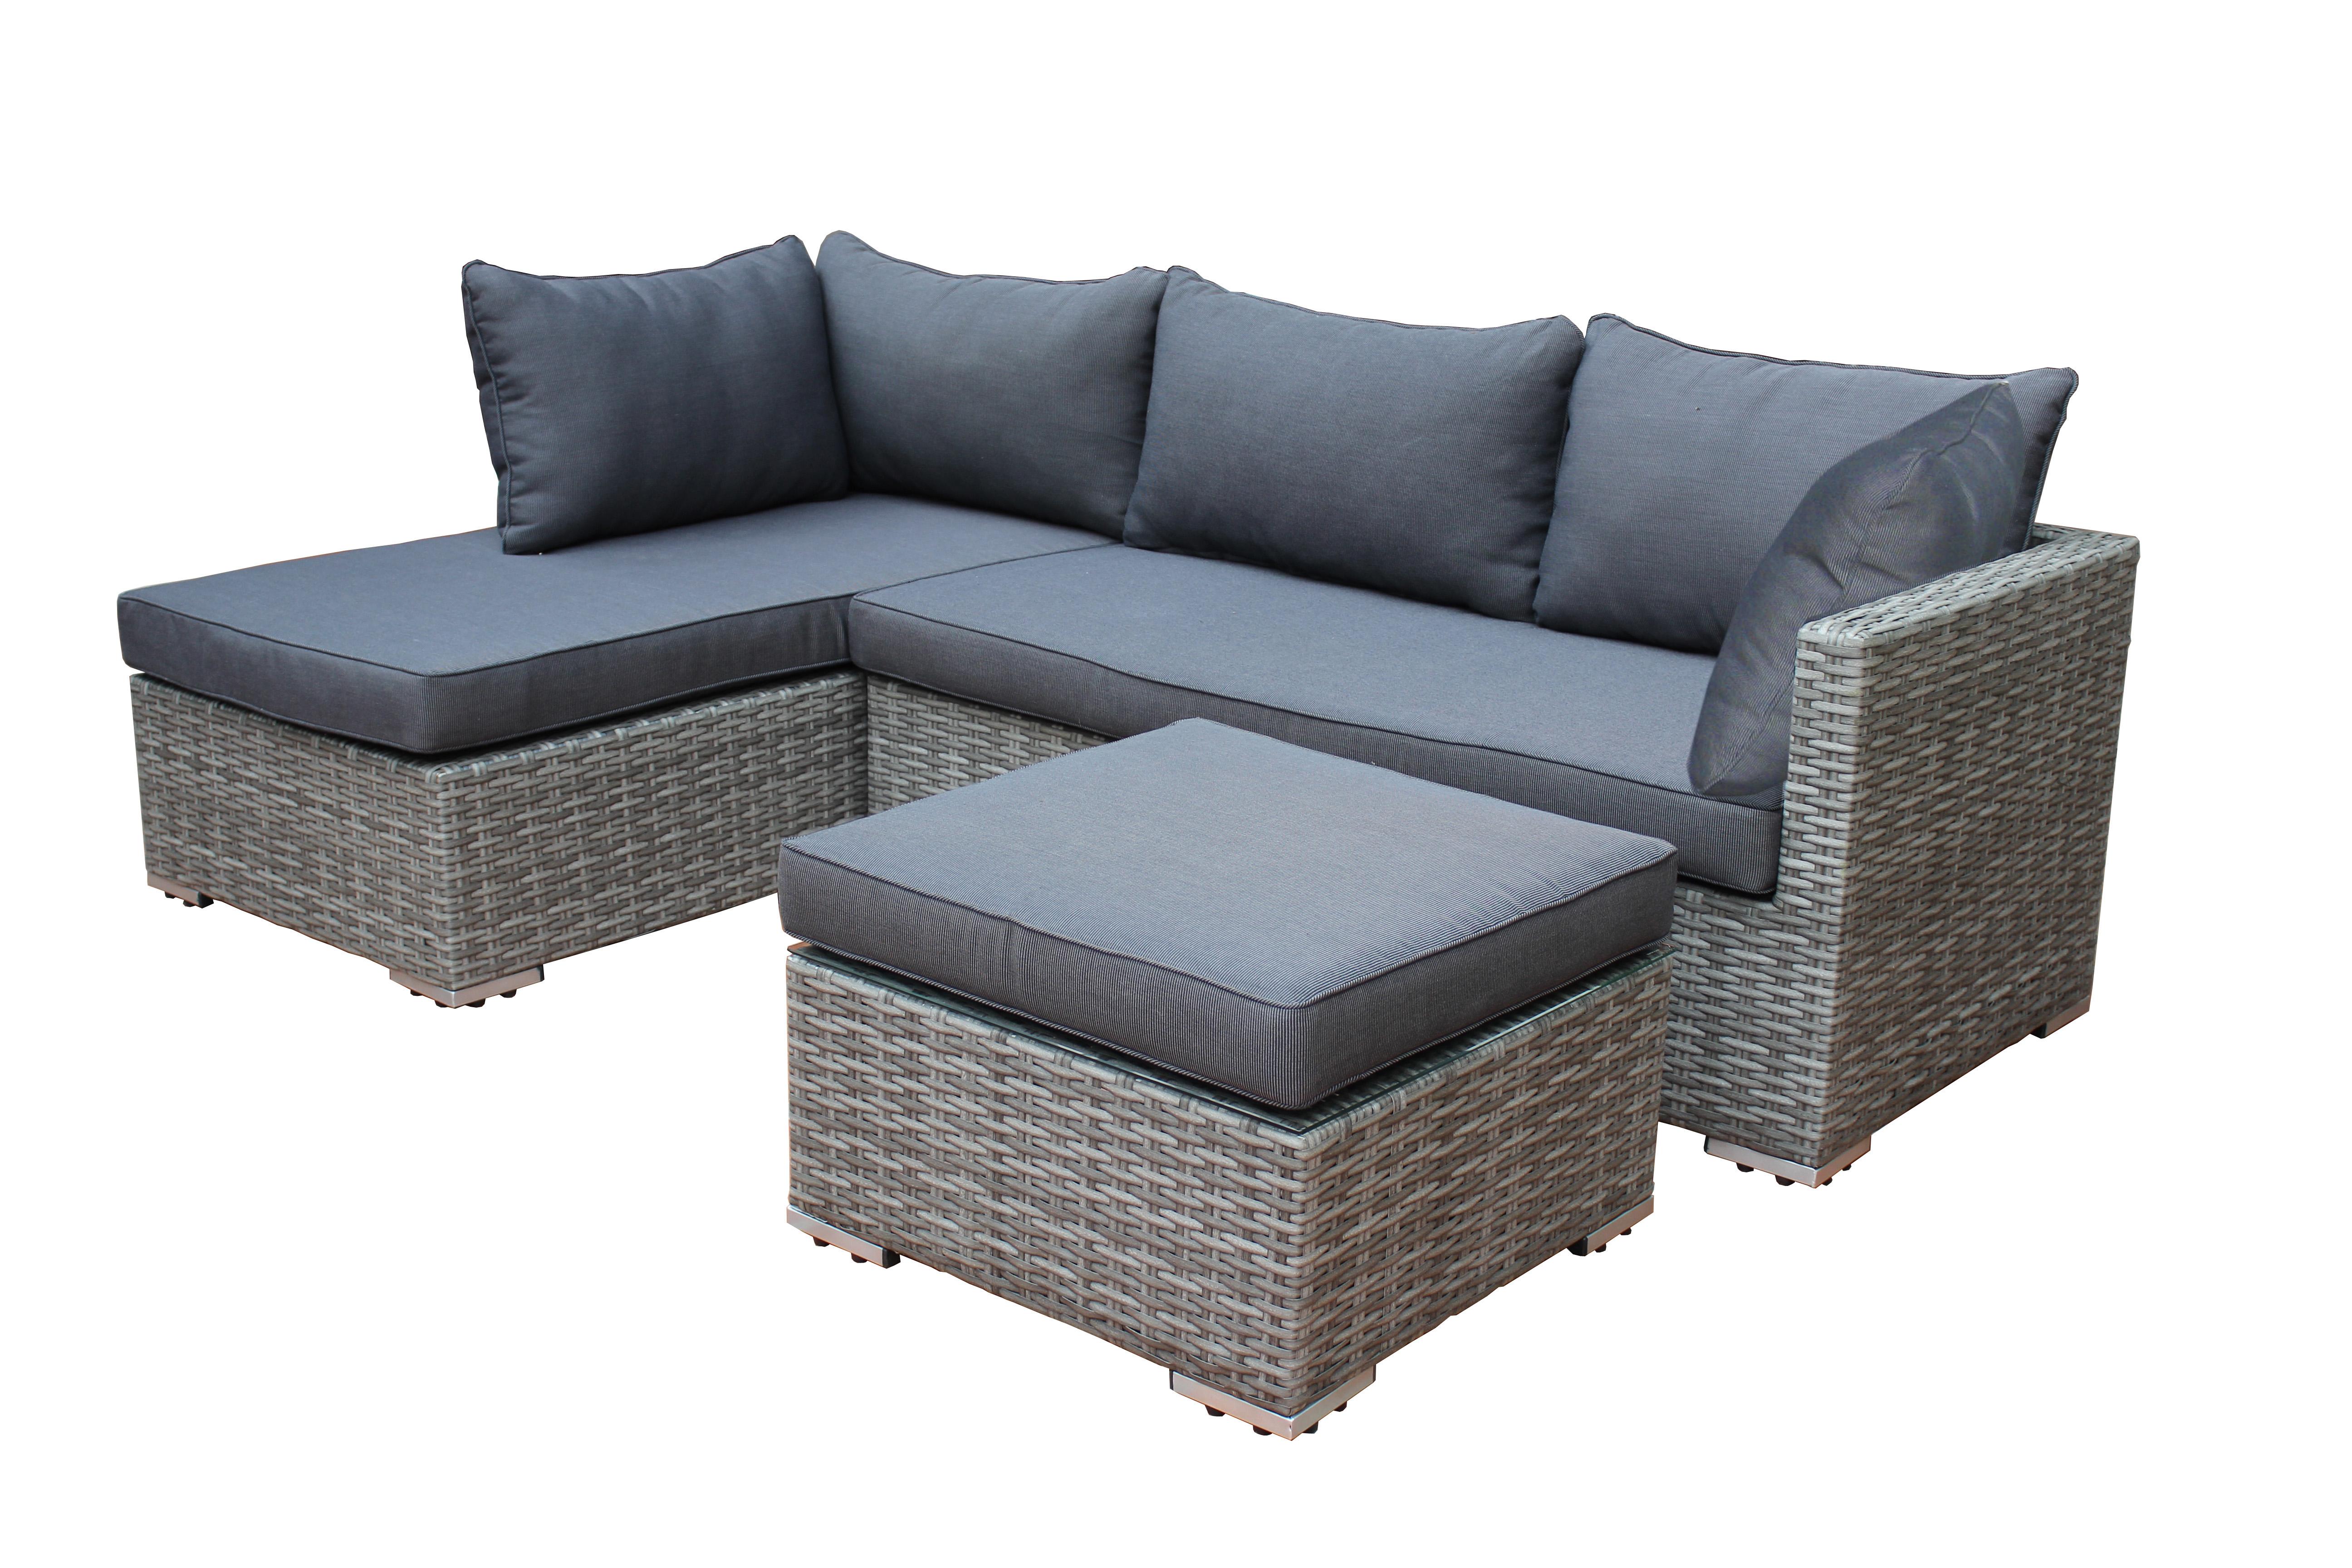 loungeset lounge gartengarnitur gartenm bel sitzgruppe. Black Bedroom Furniture Sets. Home Design Ideas